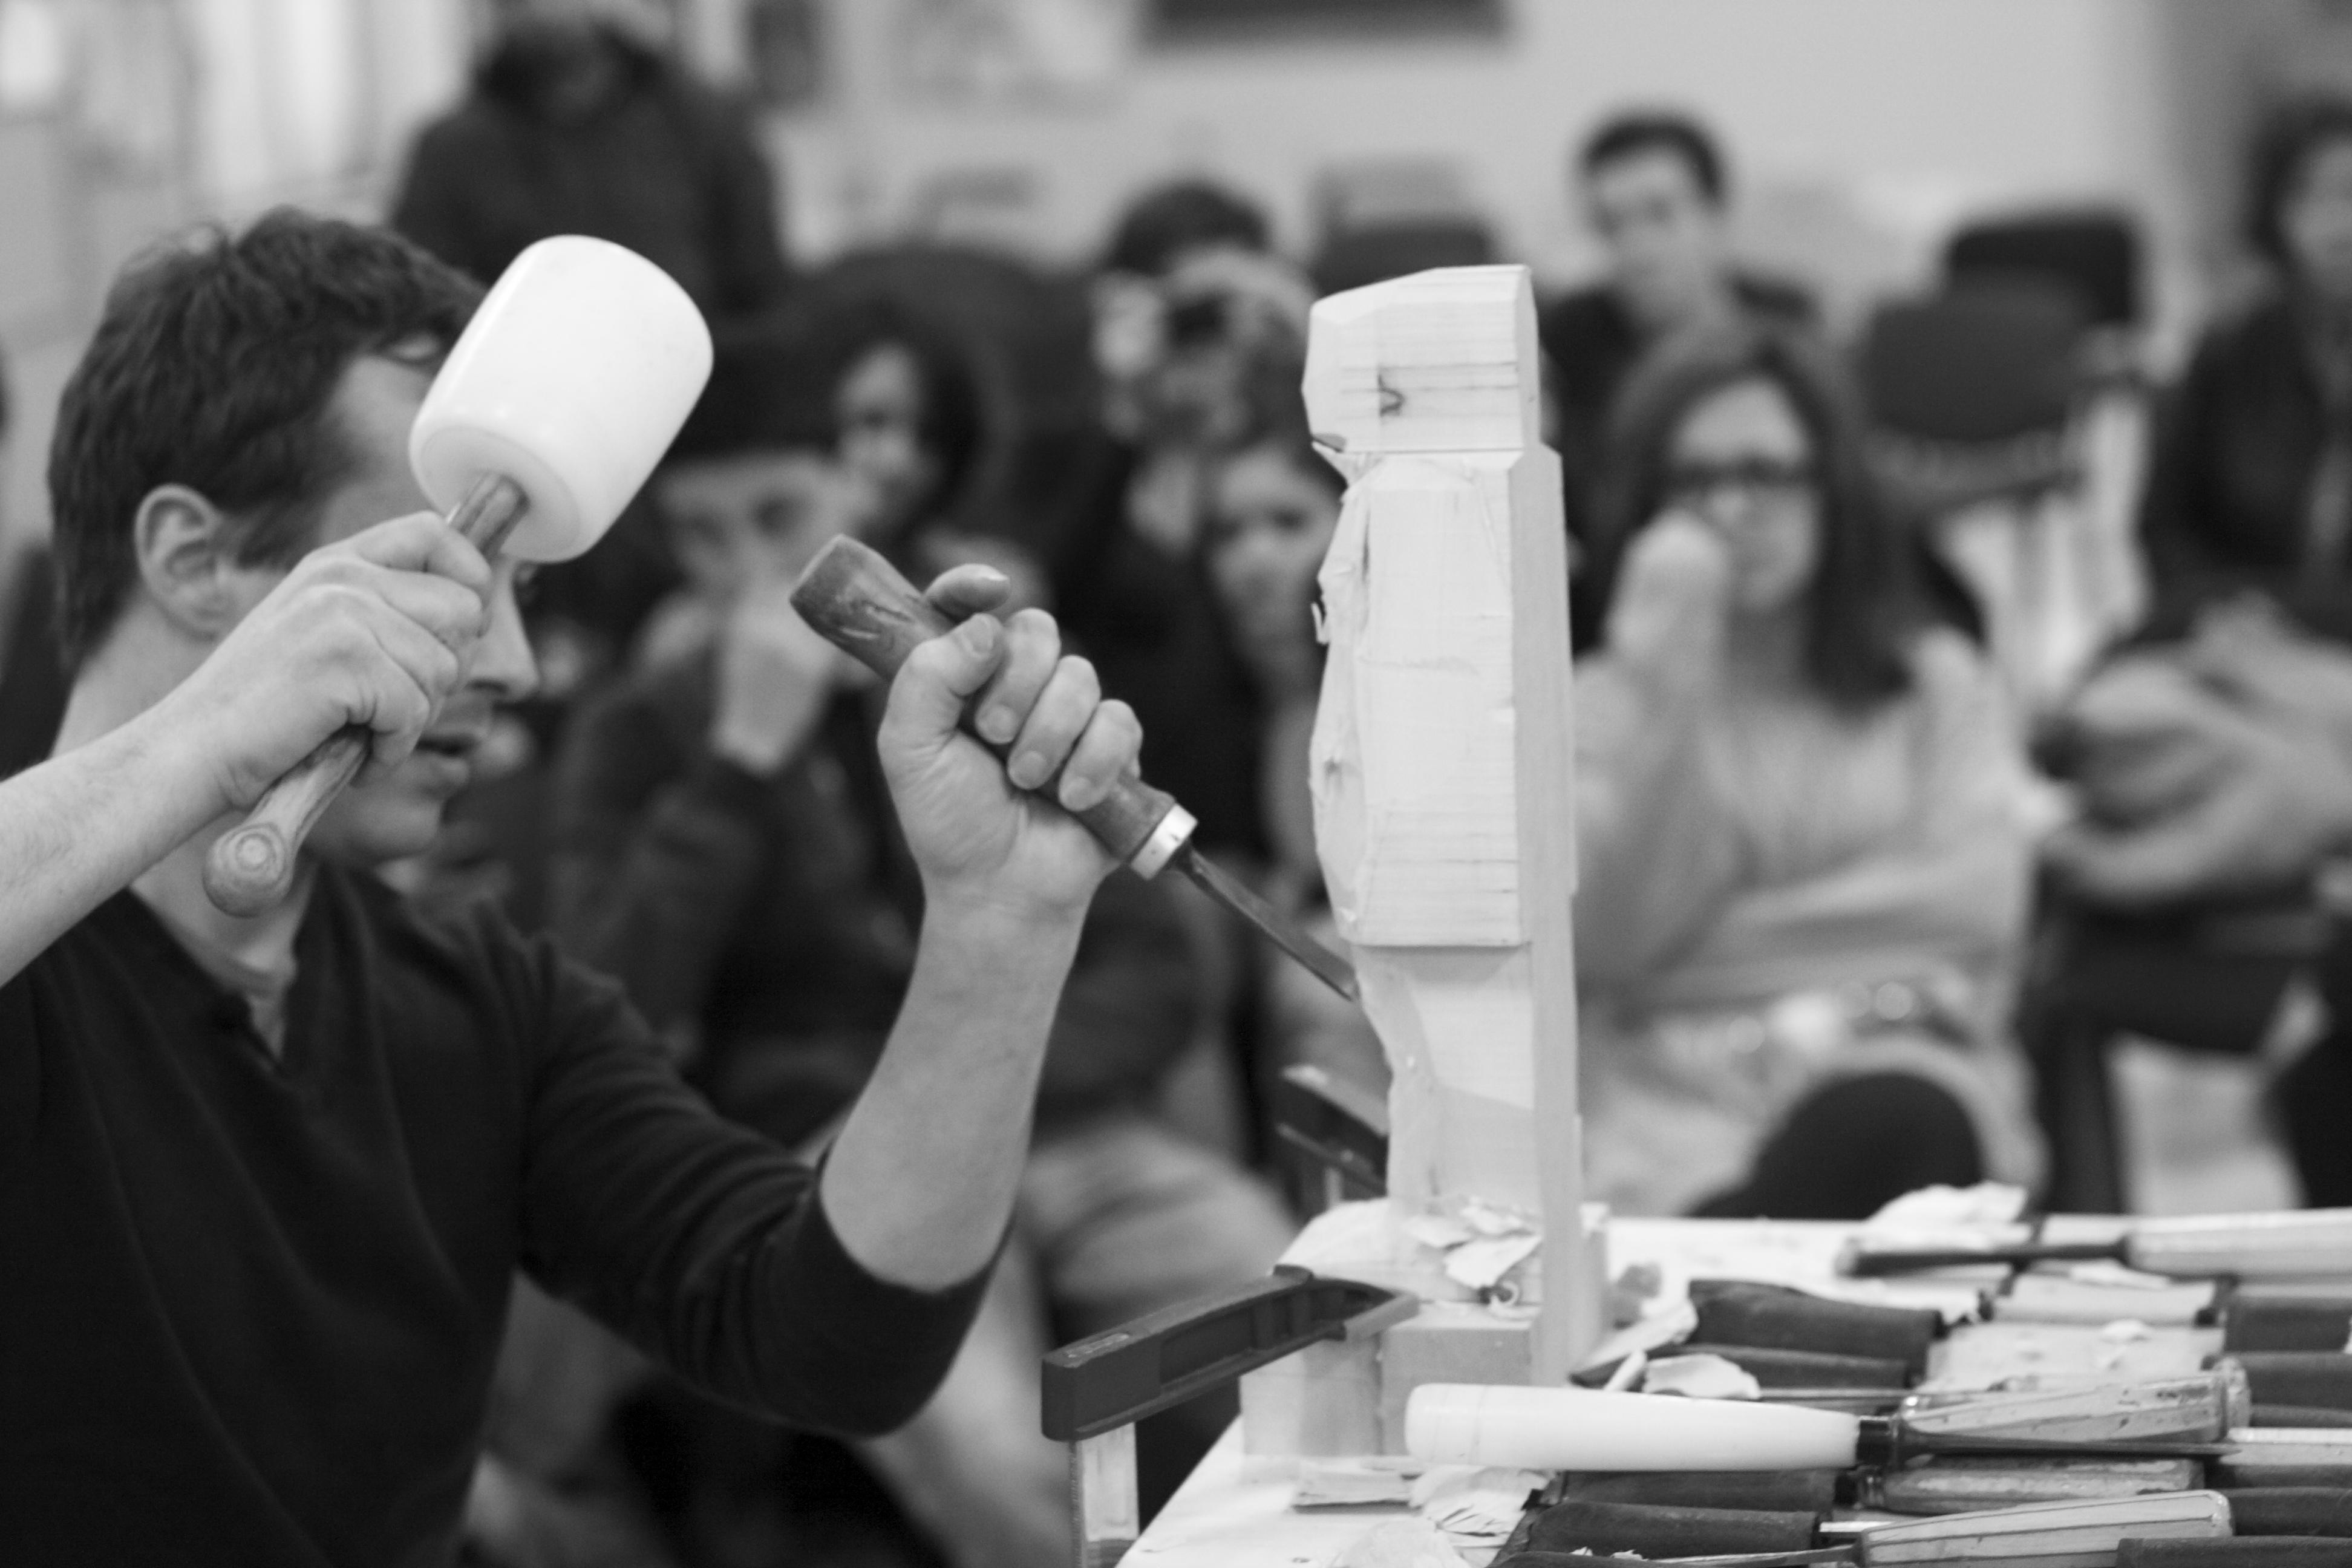 Flickr - Aron Demetz - Dialoghi e materia - Workshop a cura di Franco Reina68